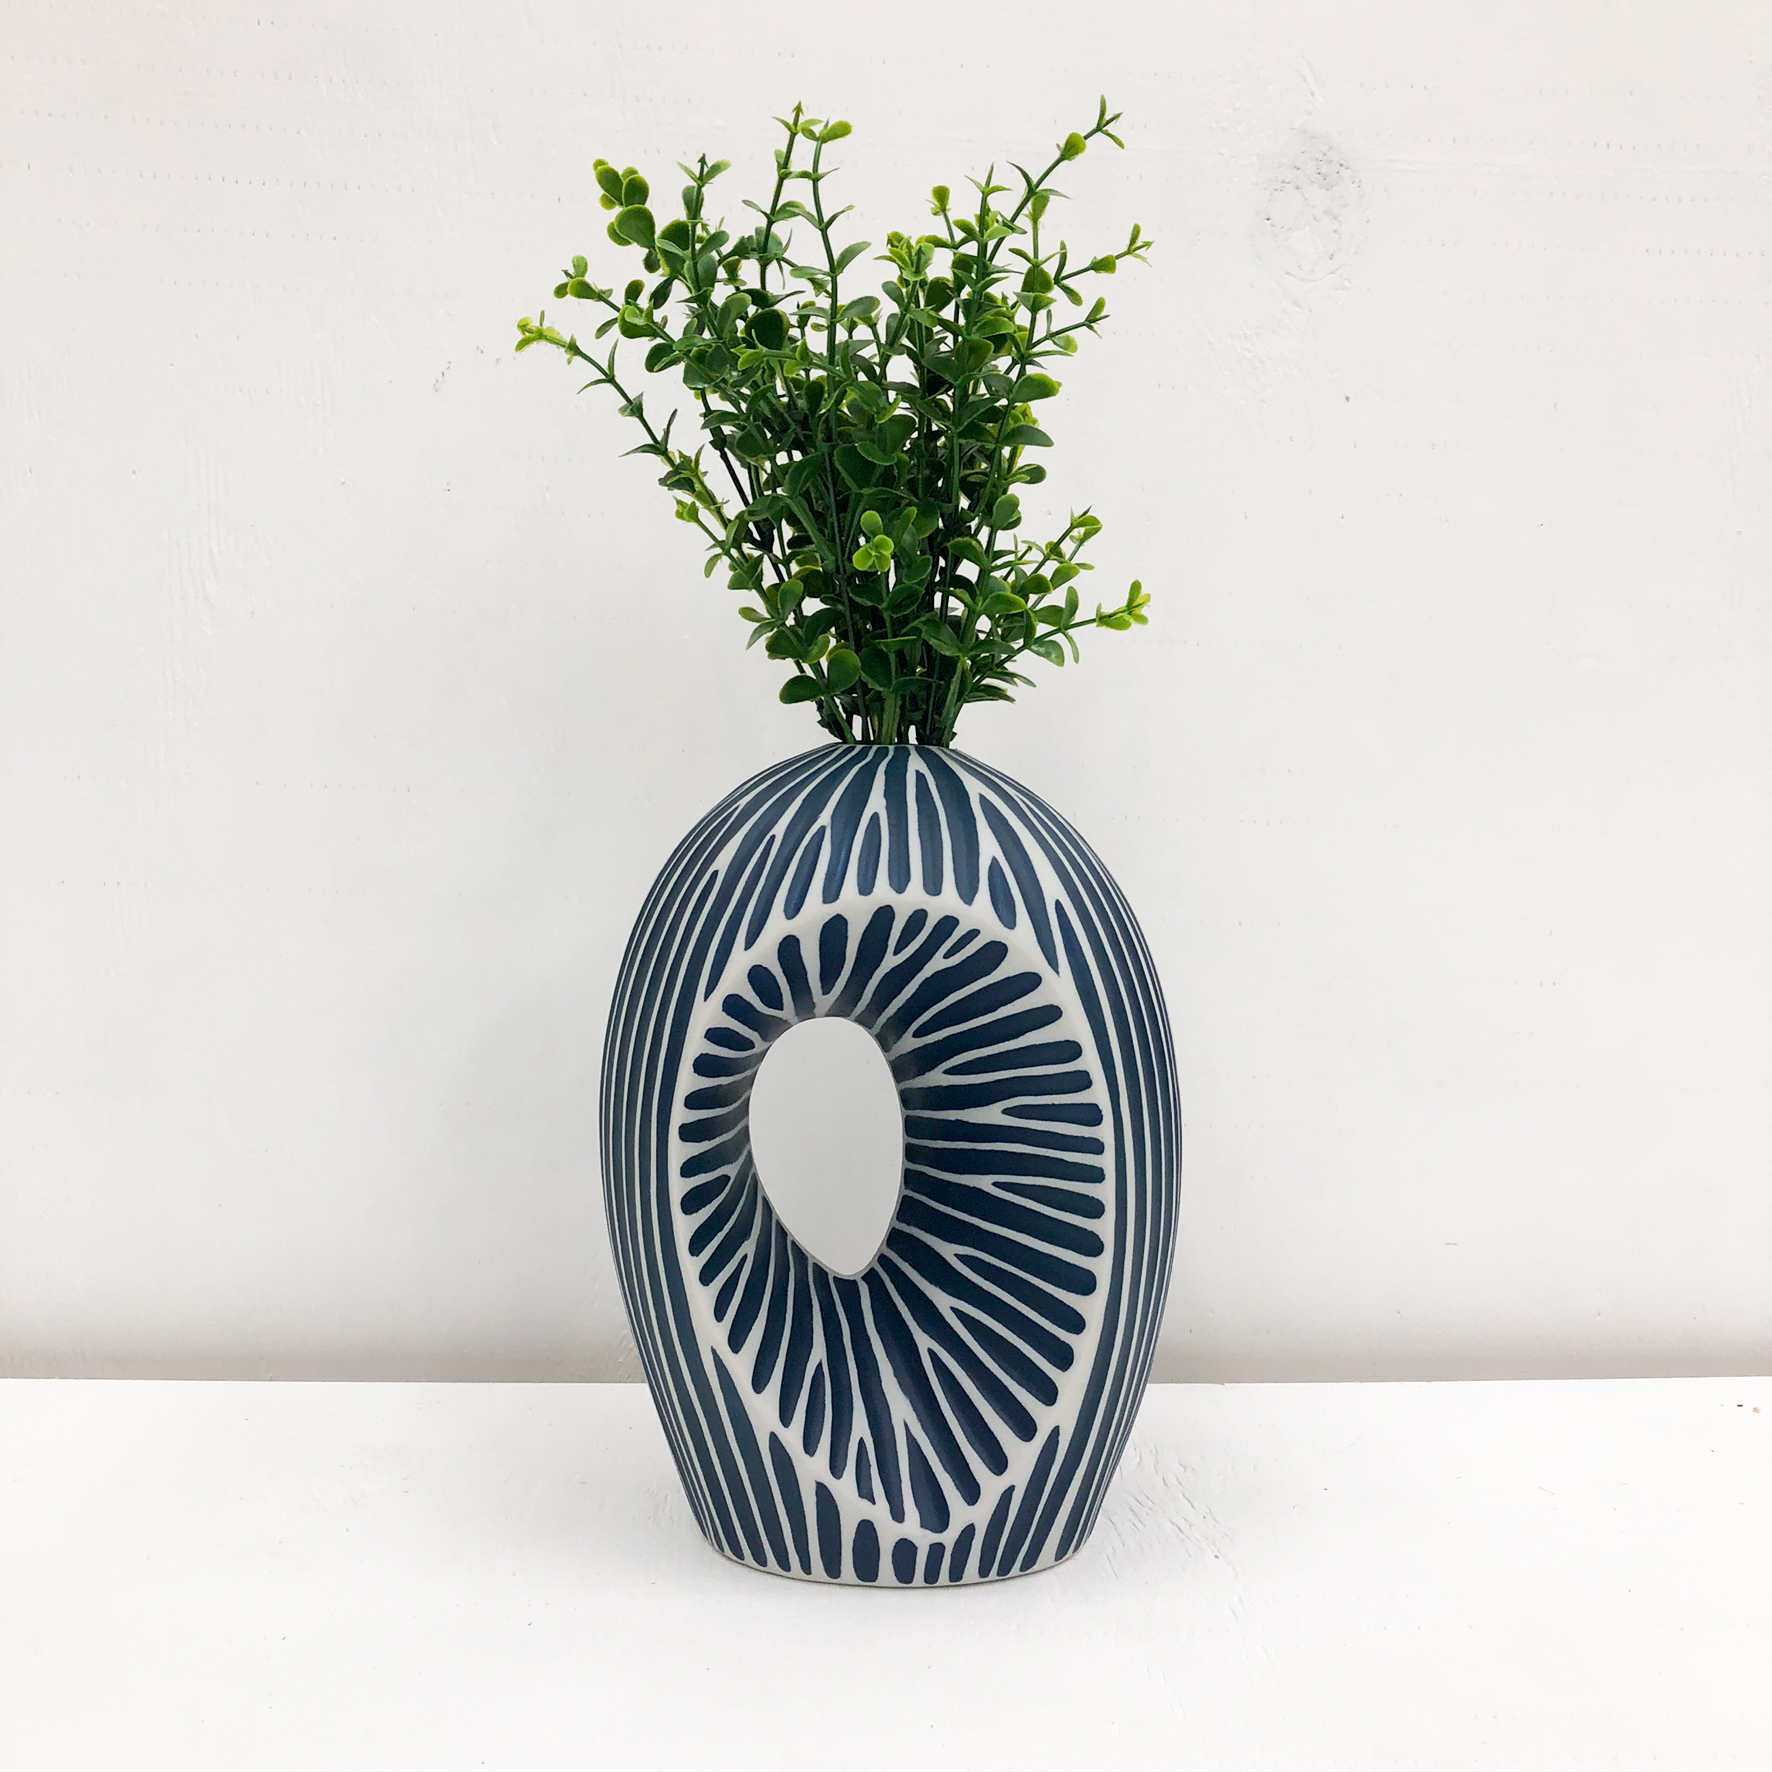 Artura MX Handmade Vase - with plant